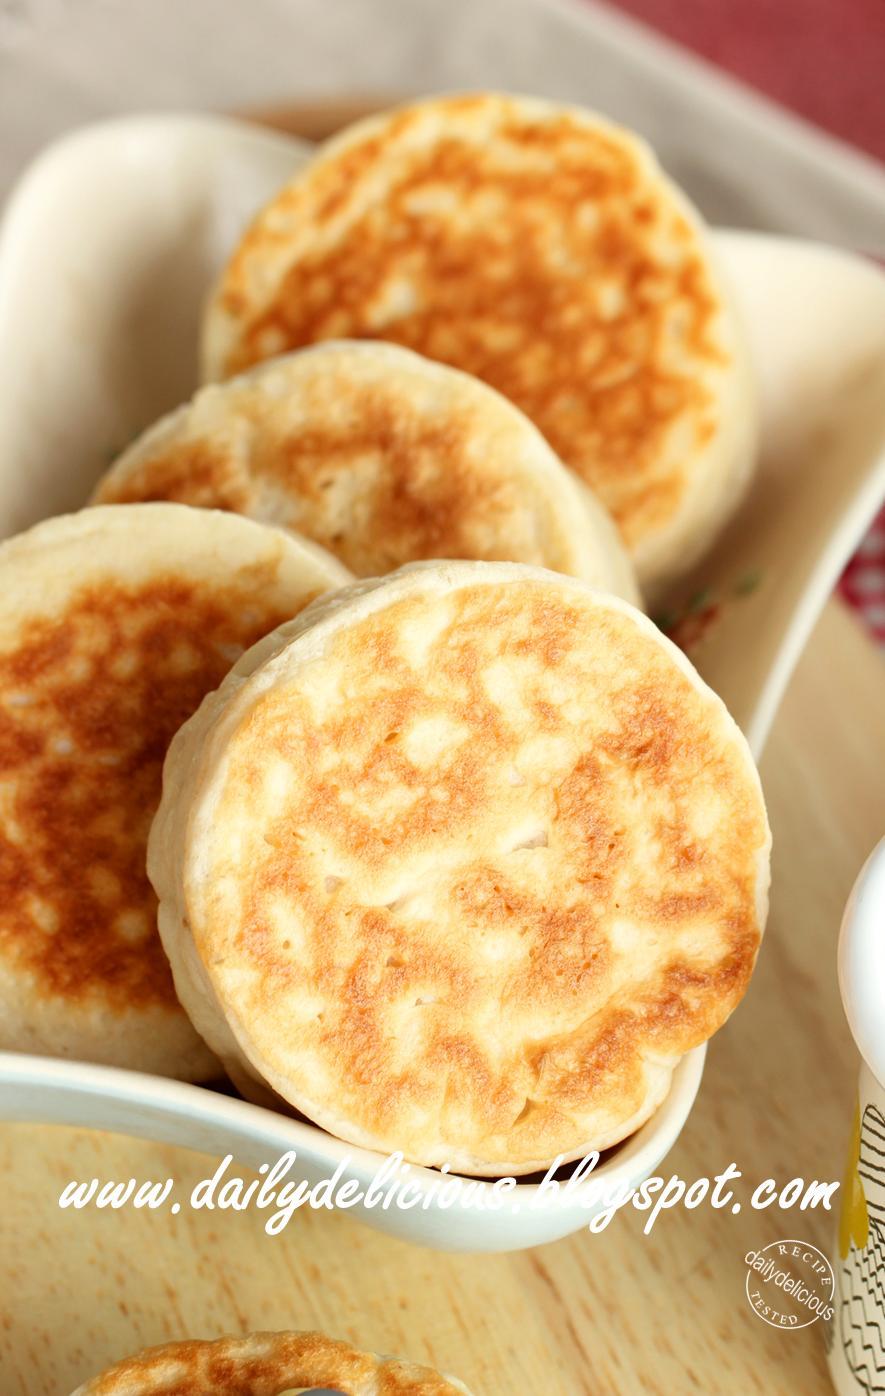 dailydelicious: Easy no oven needed bread: Crumpets